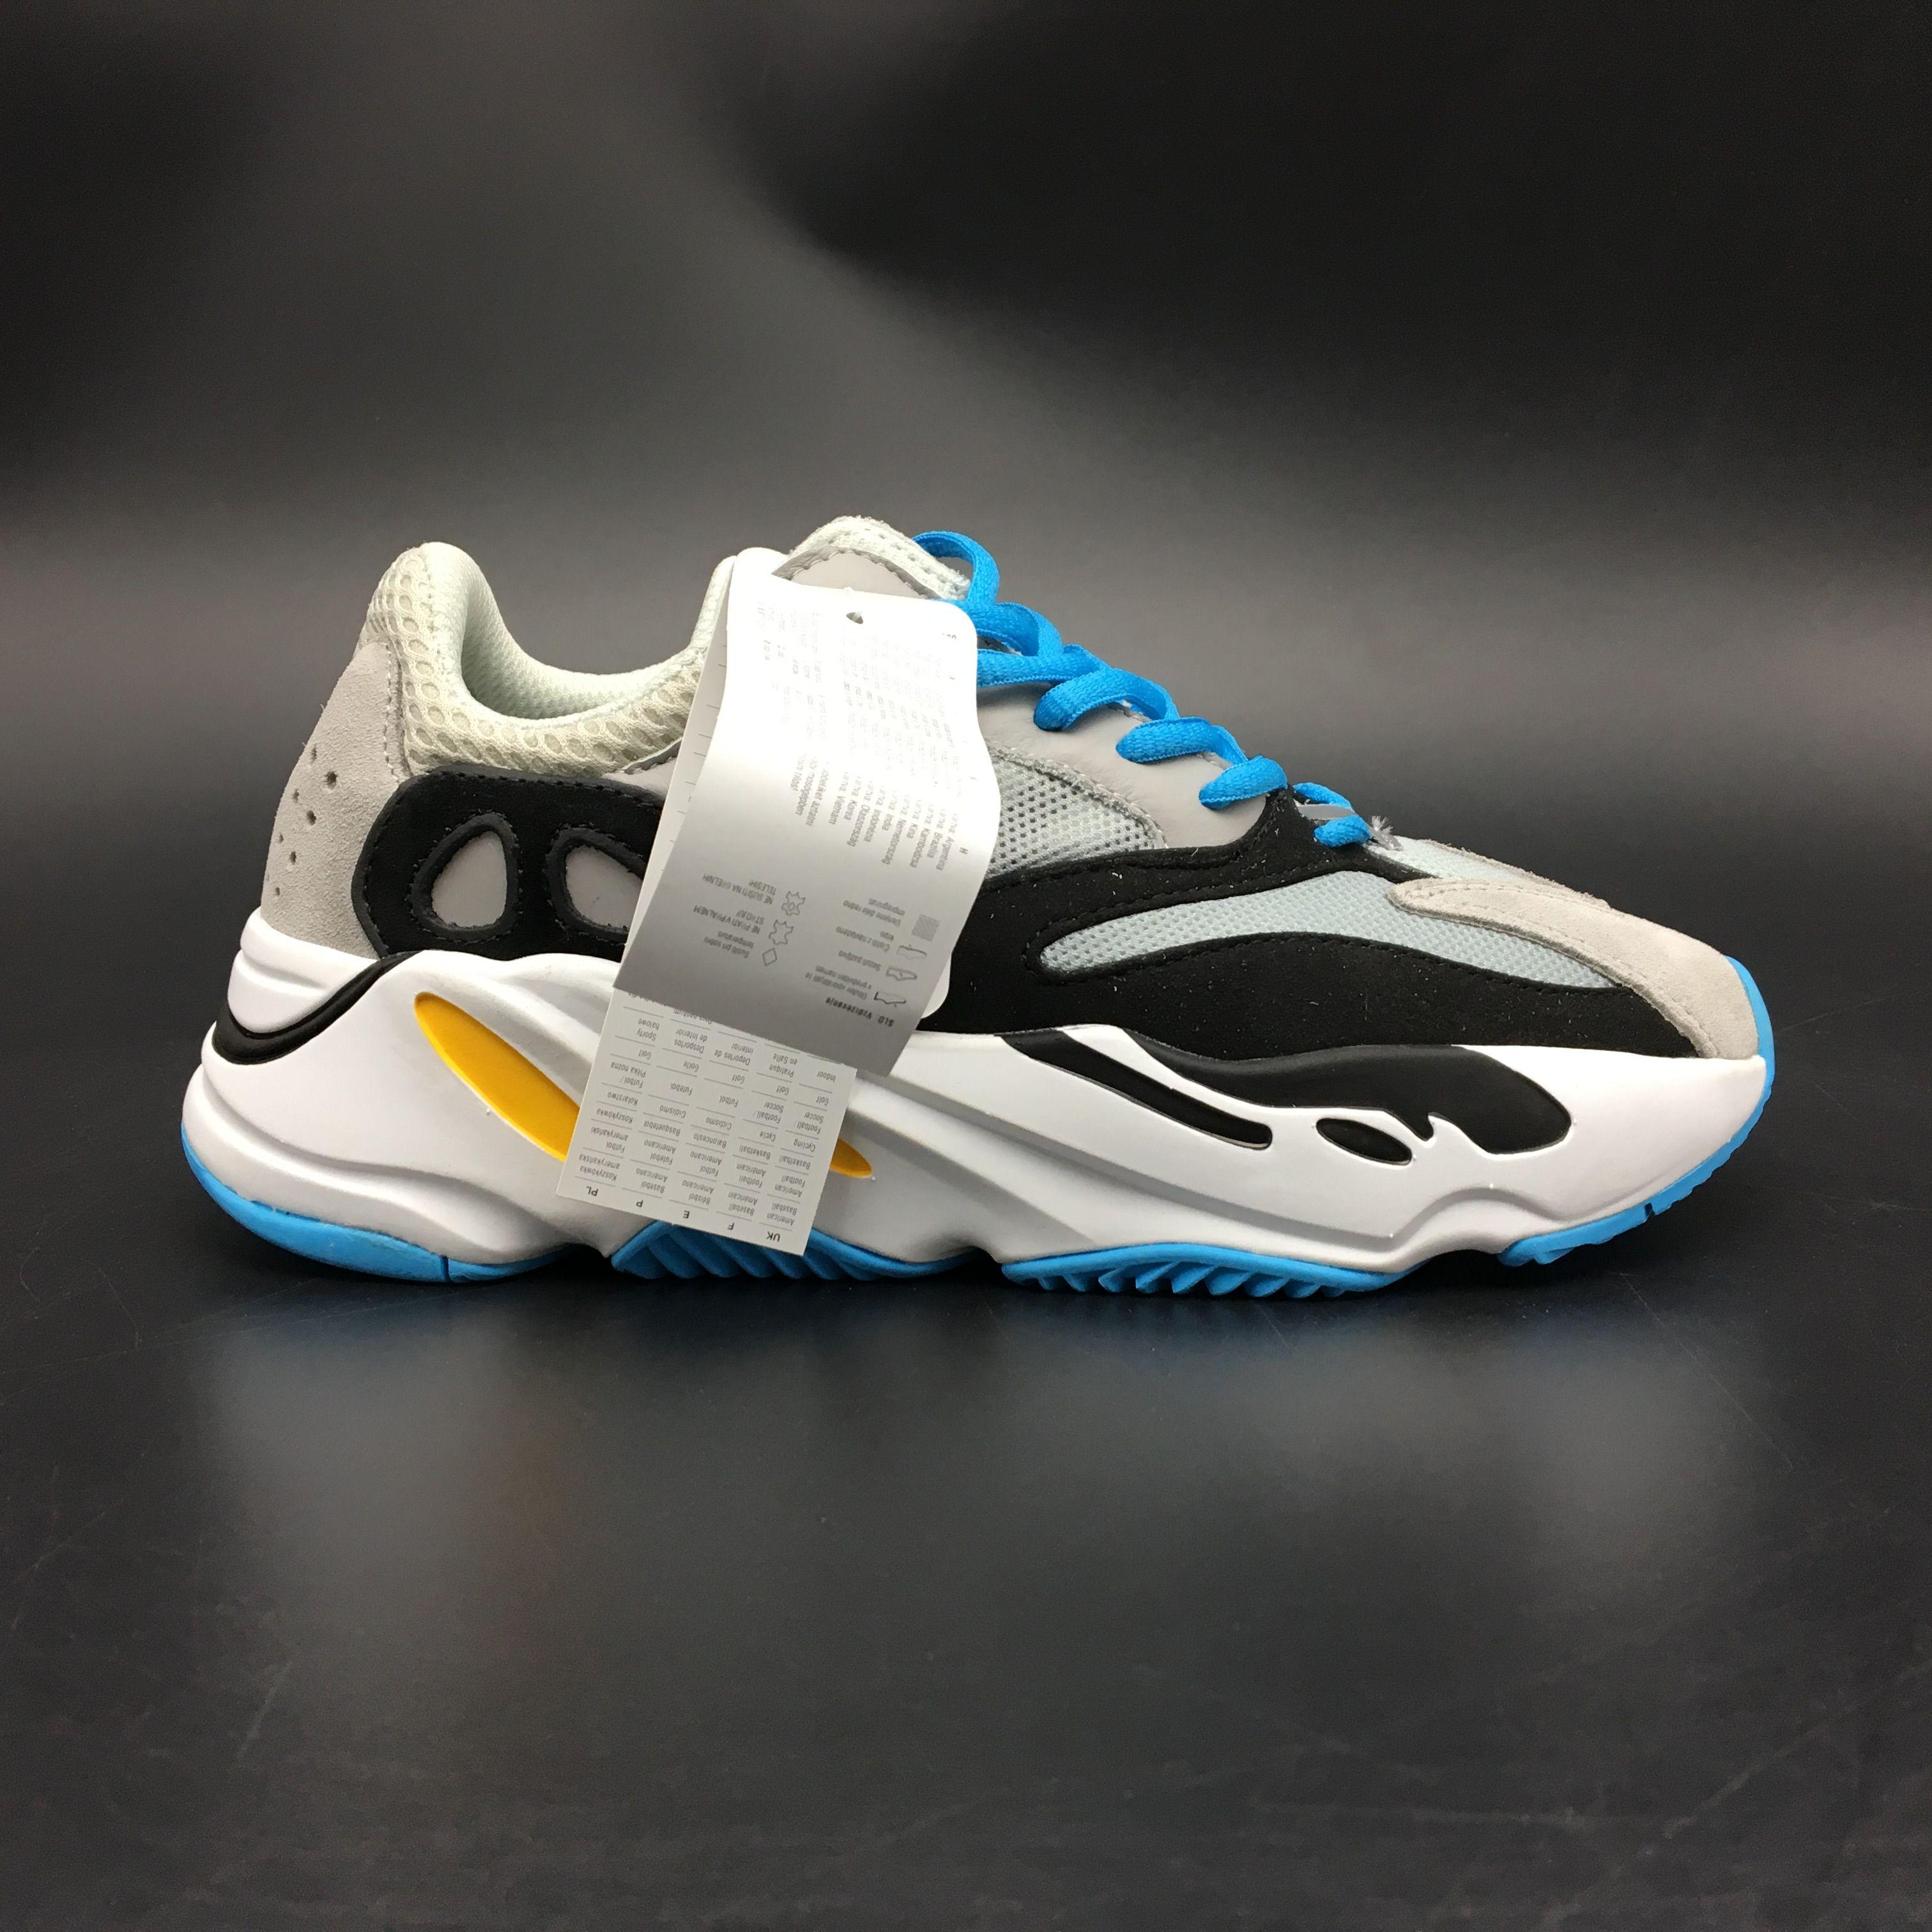 "NEW 2017 UA Adidas Yeezy Wave Runner 700 ""Gary Blue"" B75575"